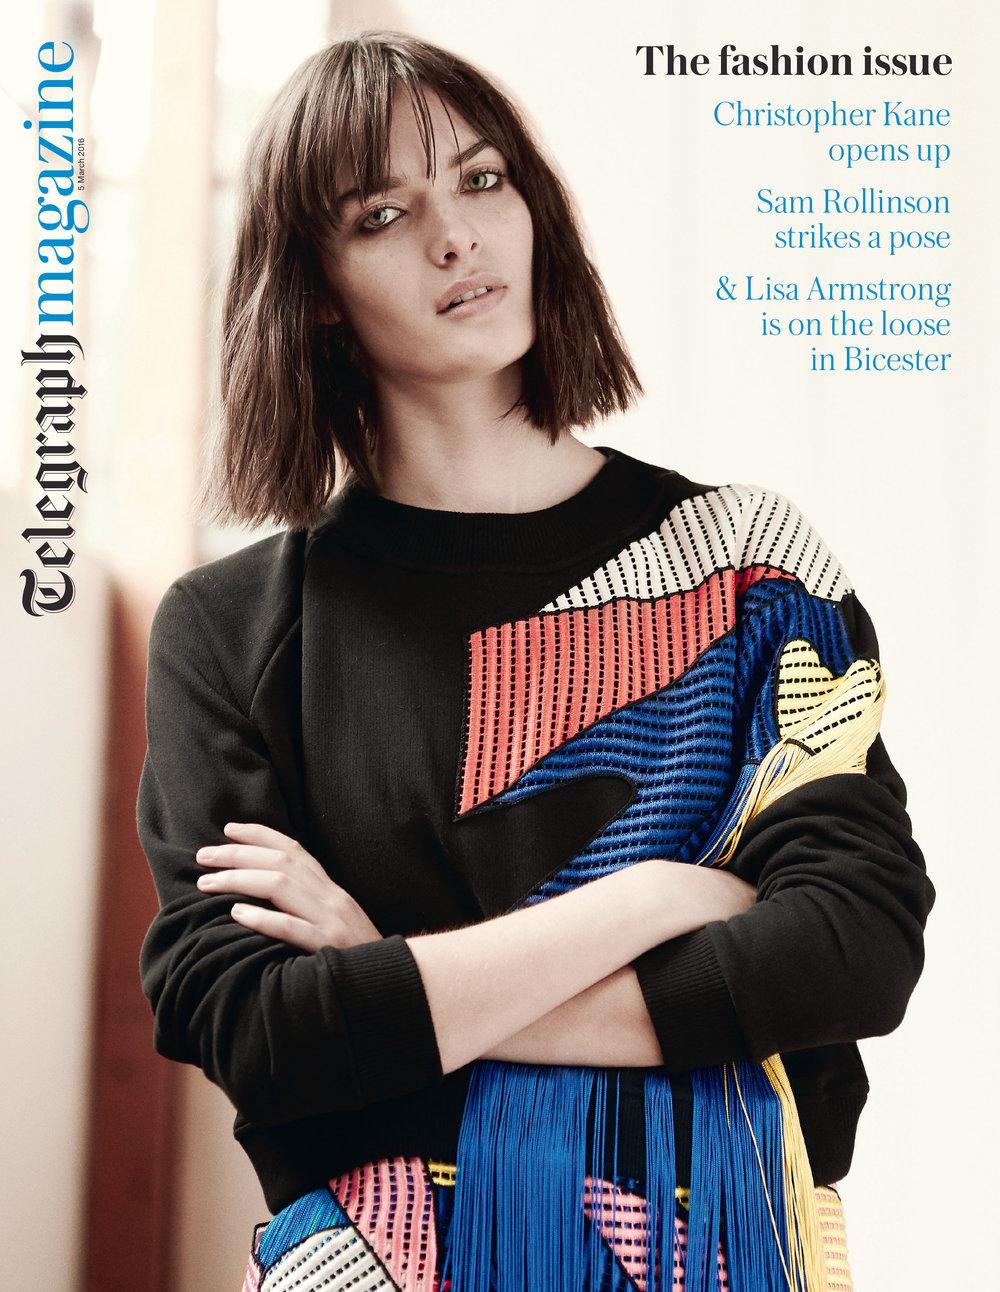 Sam-Rollinson-telegraph-cover.jpg